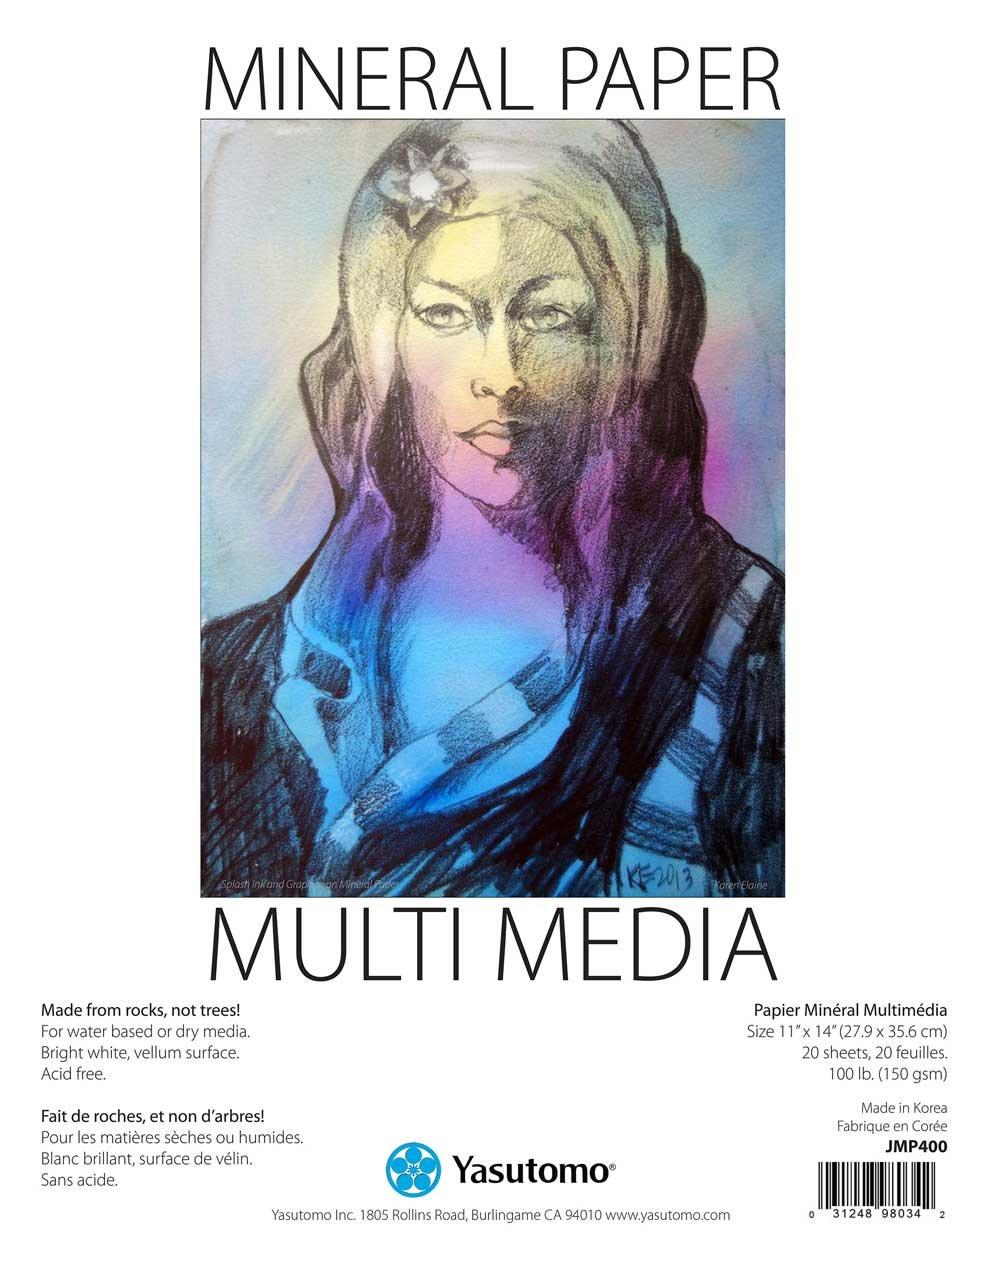 Yasutomo Mineral Paper Multi-Media Artists Pad, 11 X 14 inches, 20 Sheets (JMP400) 4336880394